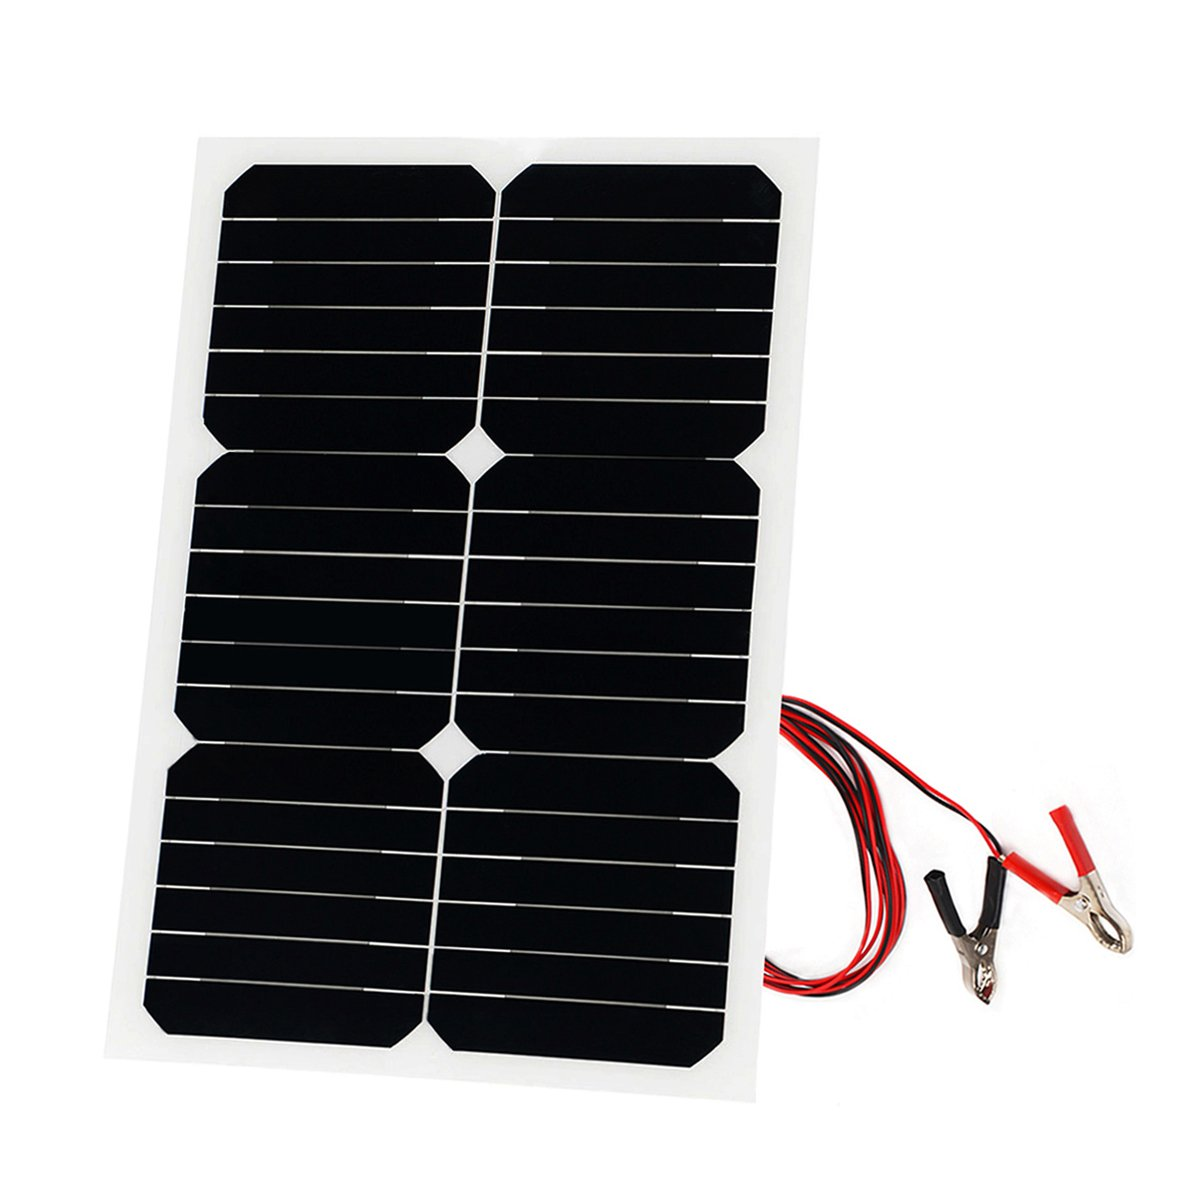 20 Watt Solar Panel Sunpower 18V 12V Portable Solar Panel Charger Bendable Thin Lightweight Solar Panel Battery Charger for RV, Car, Motorcycle, Boat Solar Module